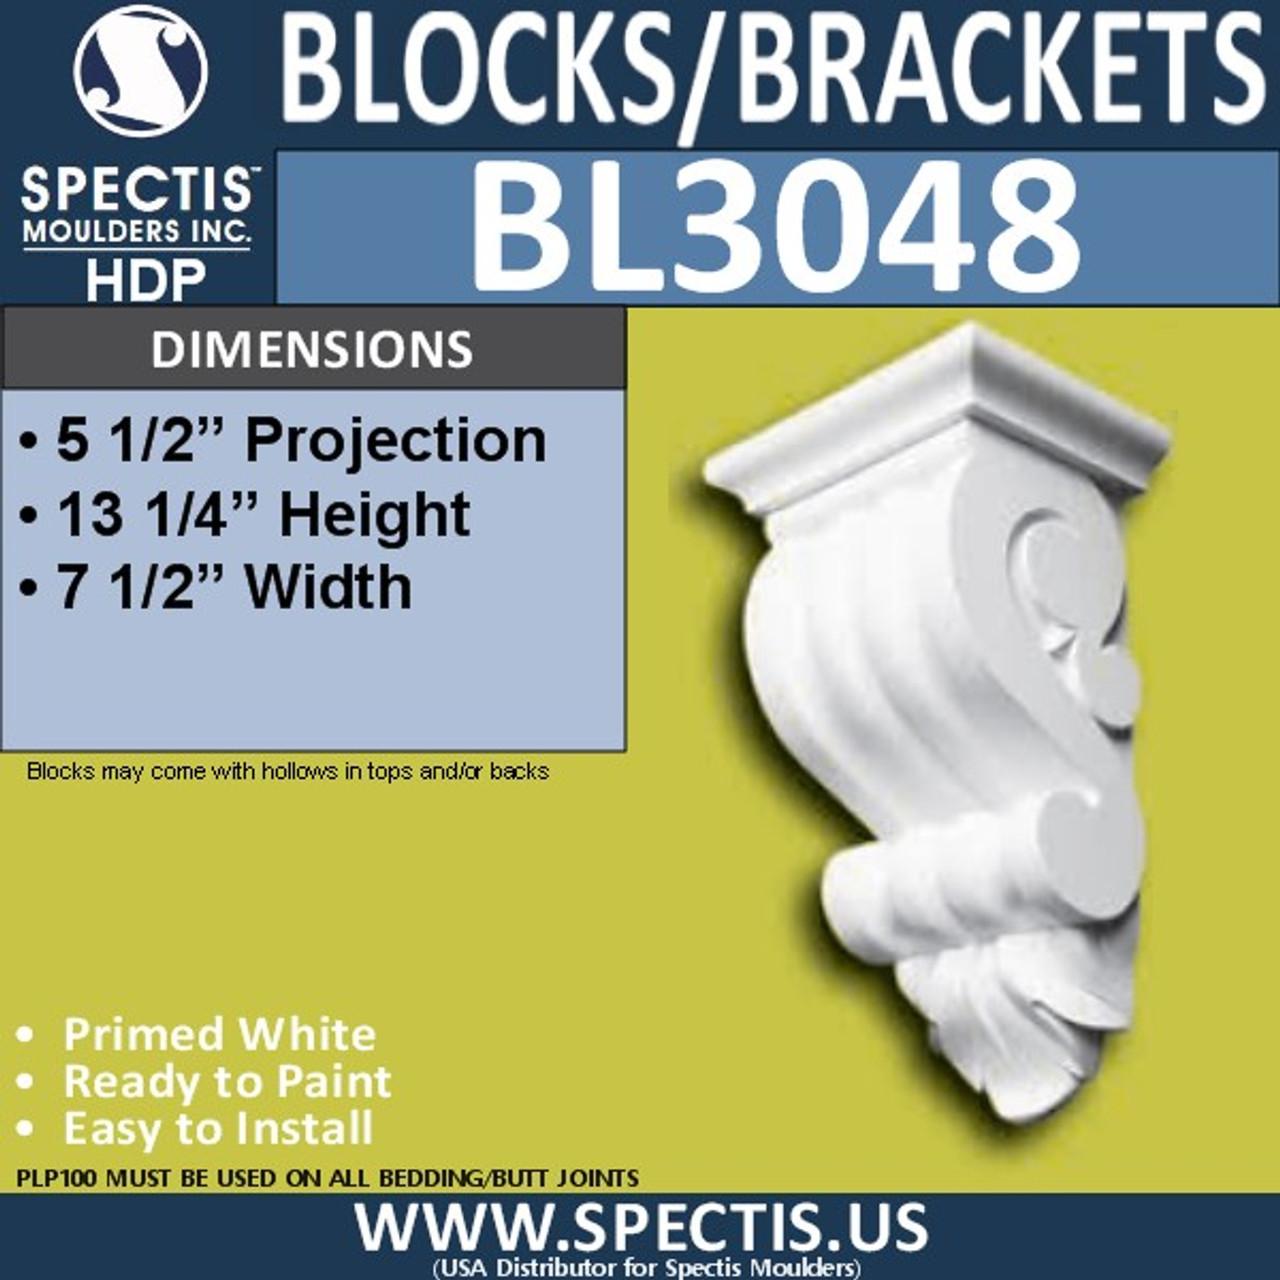 "BL3048 Eave Block or Bracket 7.5""W x 13.25""H x 5.5"" P"